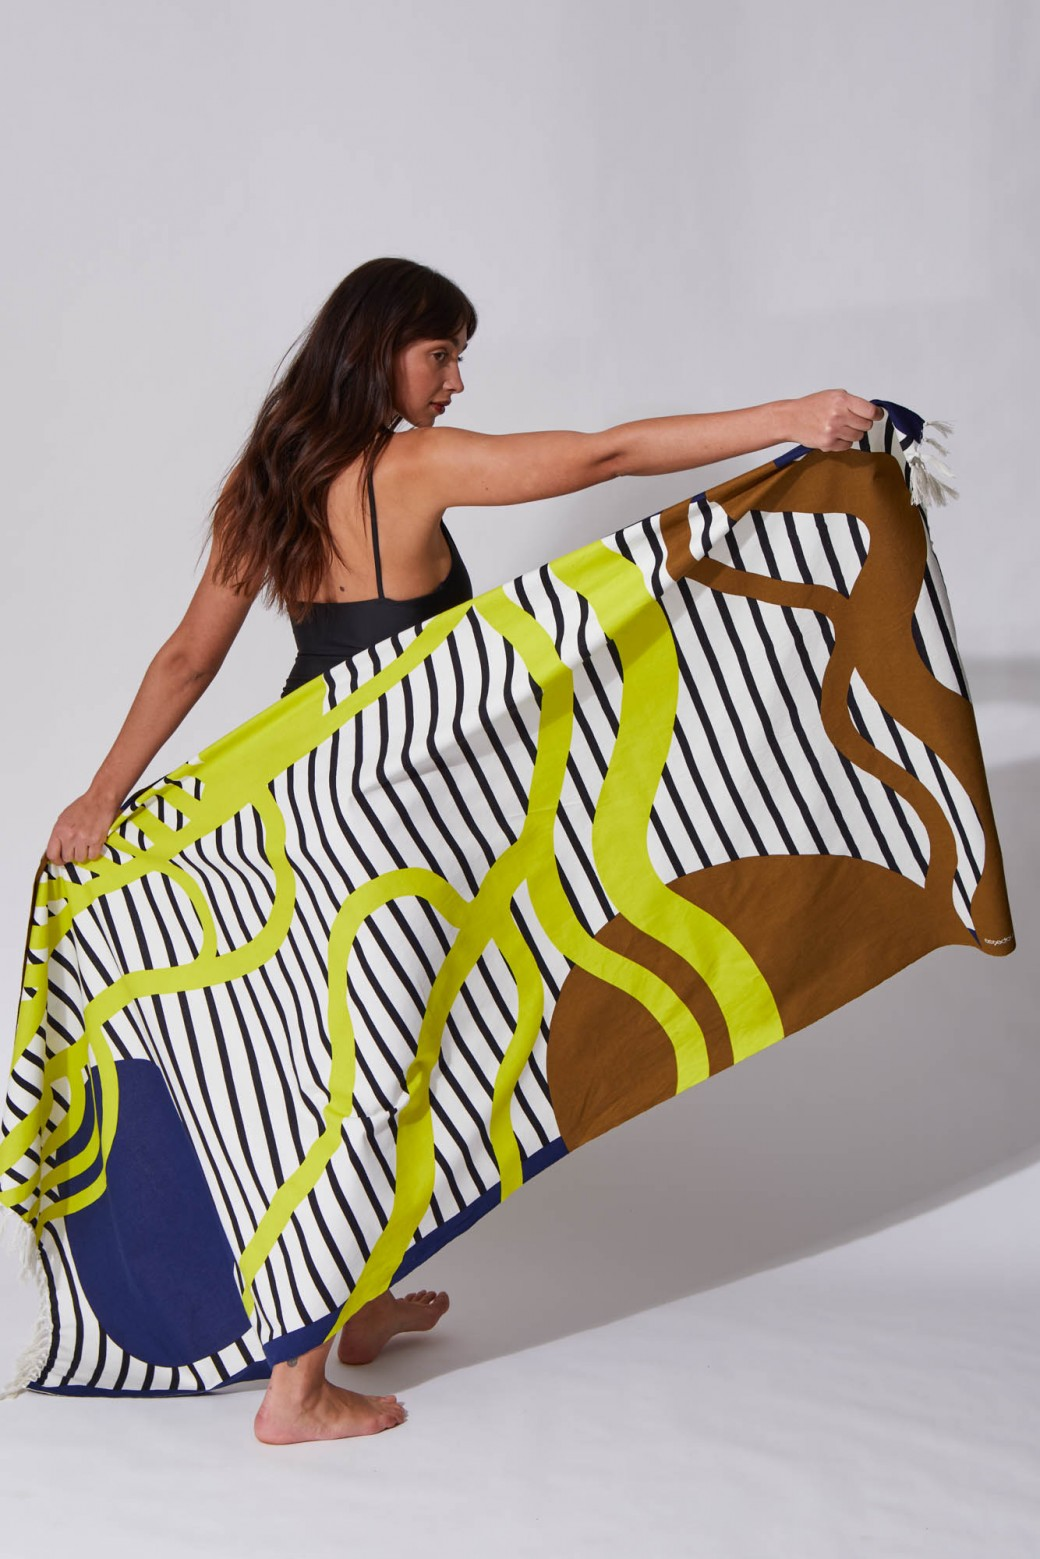 Soleil Couchant Lime Beach Towel